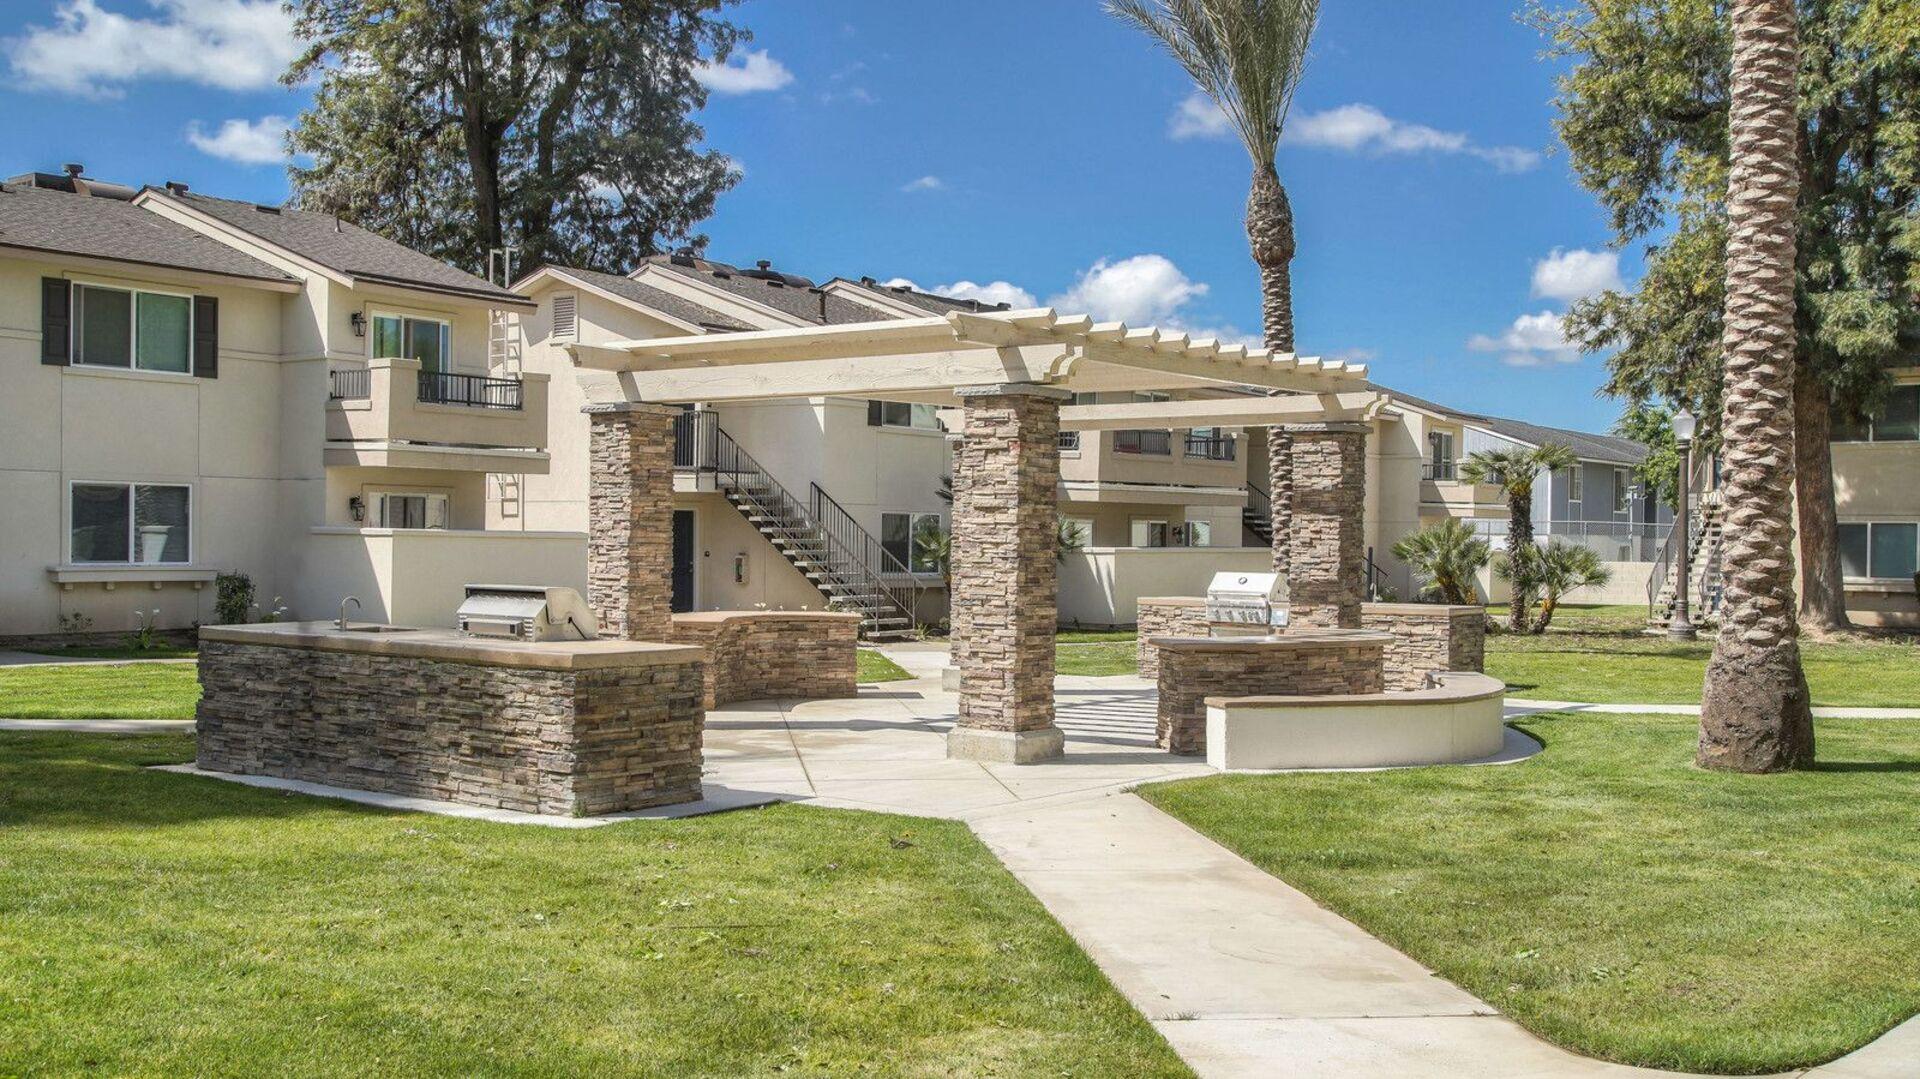 Best Fresno Neighborhoods: Where to Live |Fresno Neighborhoods